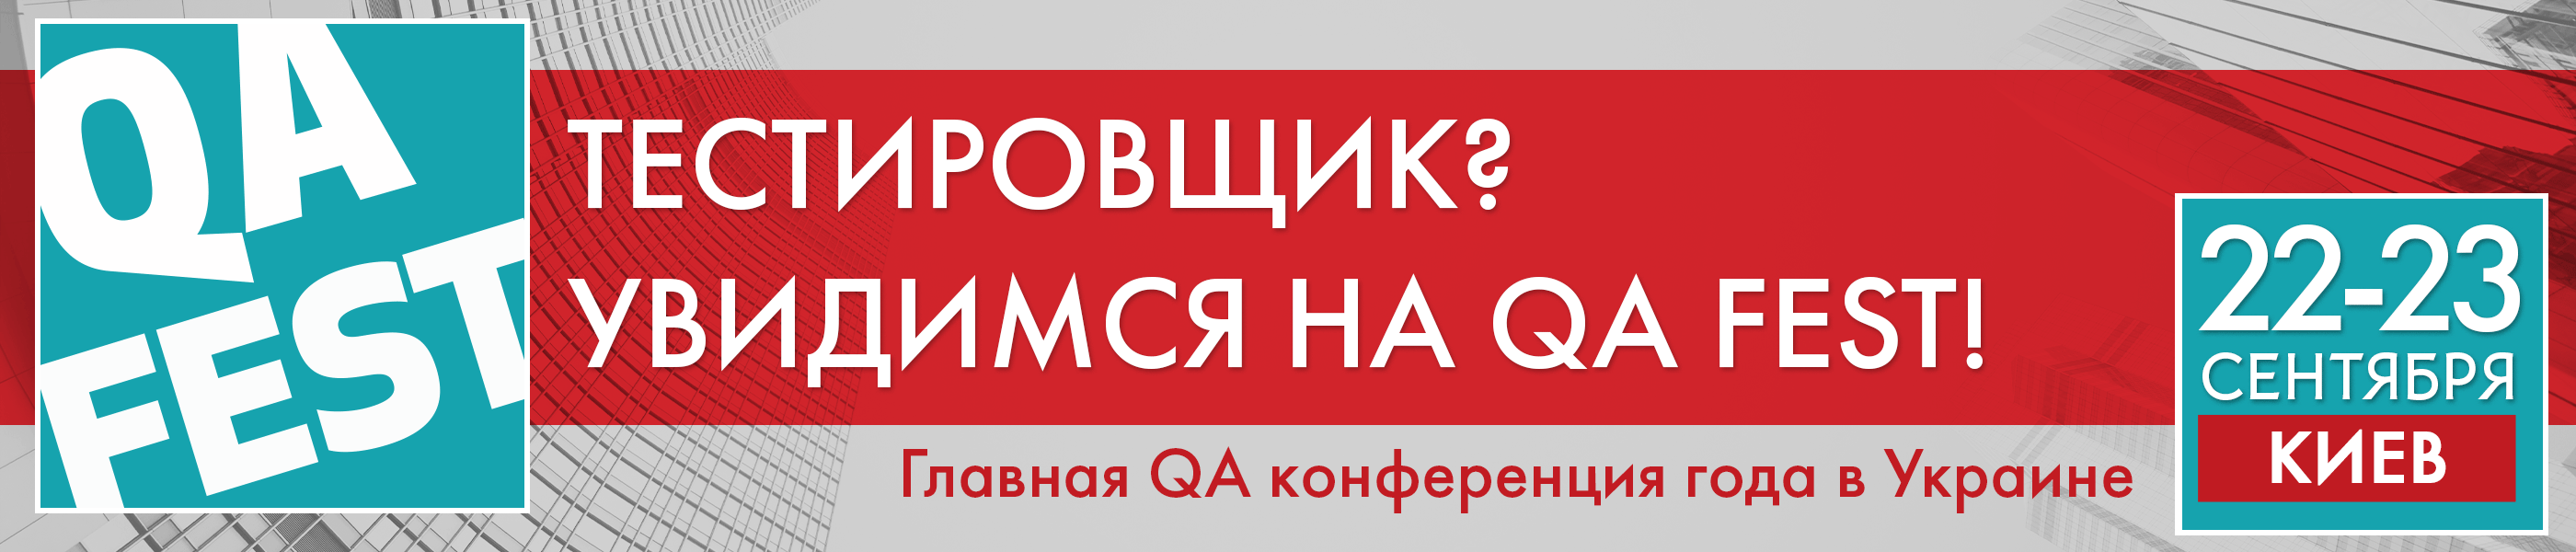 QA_fest_DOU3_mac